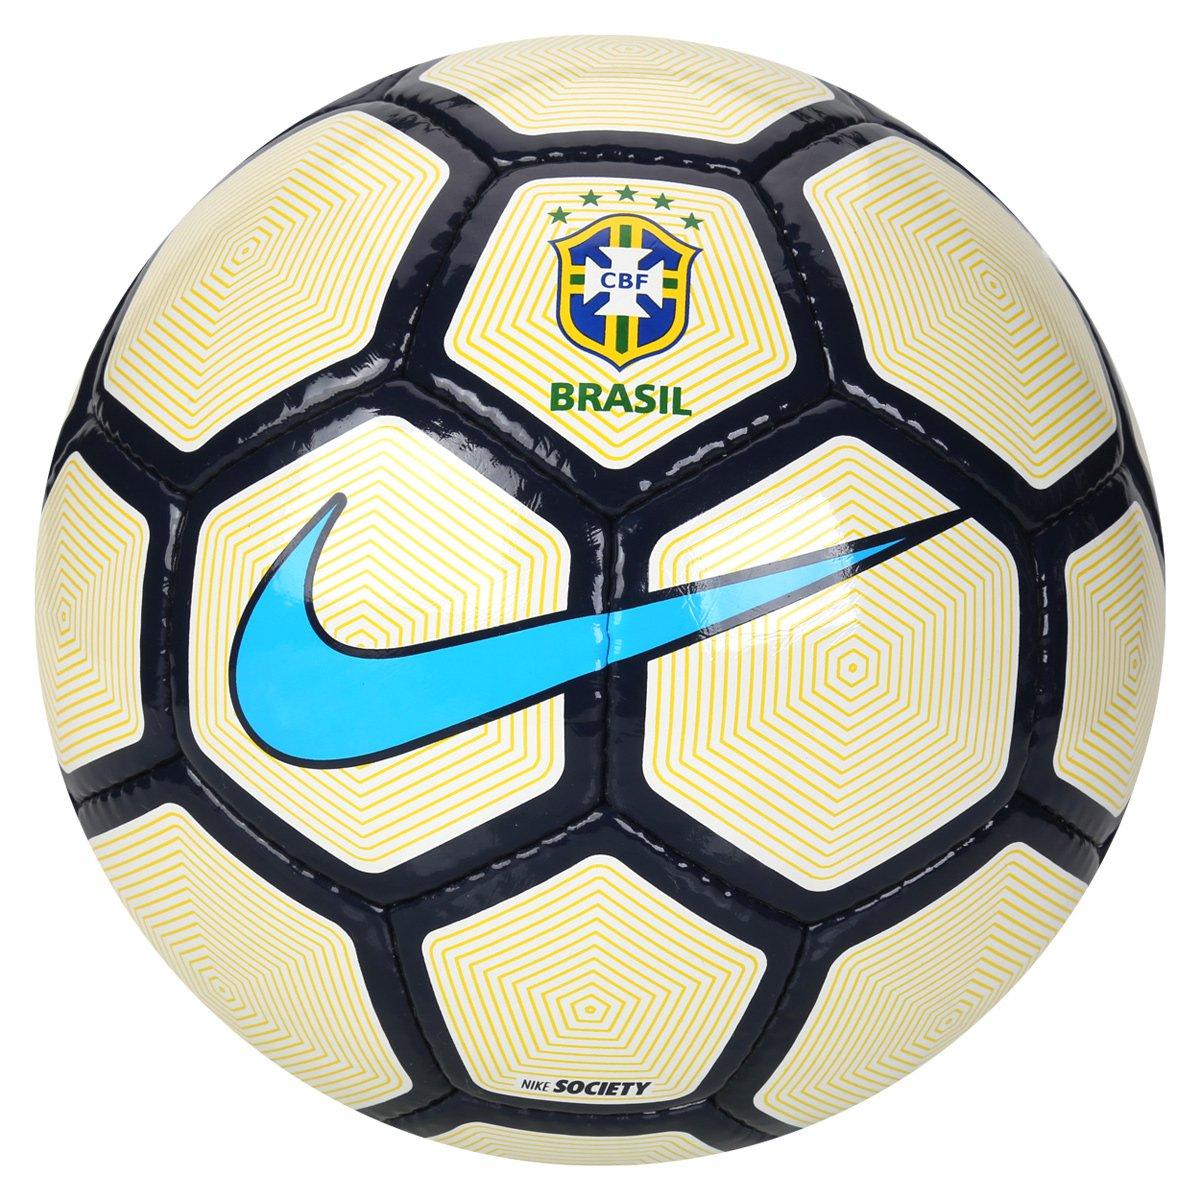 Bola Futebol Society Nike CBF - Compre Agora  a427c988c503f